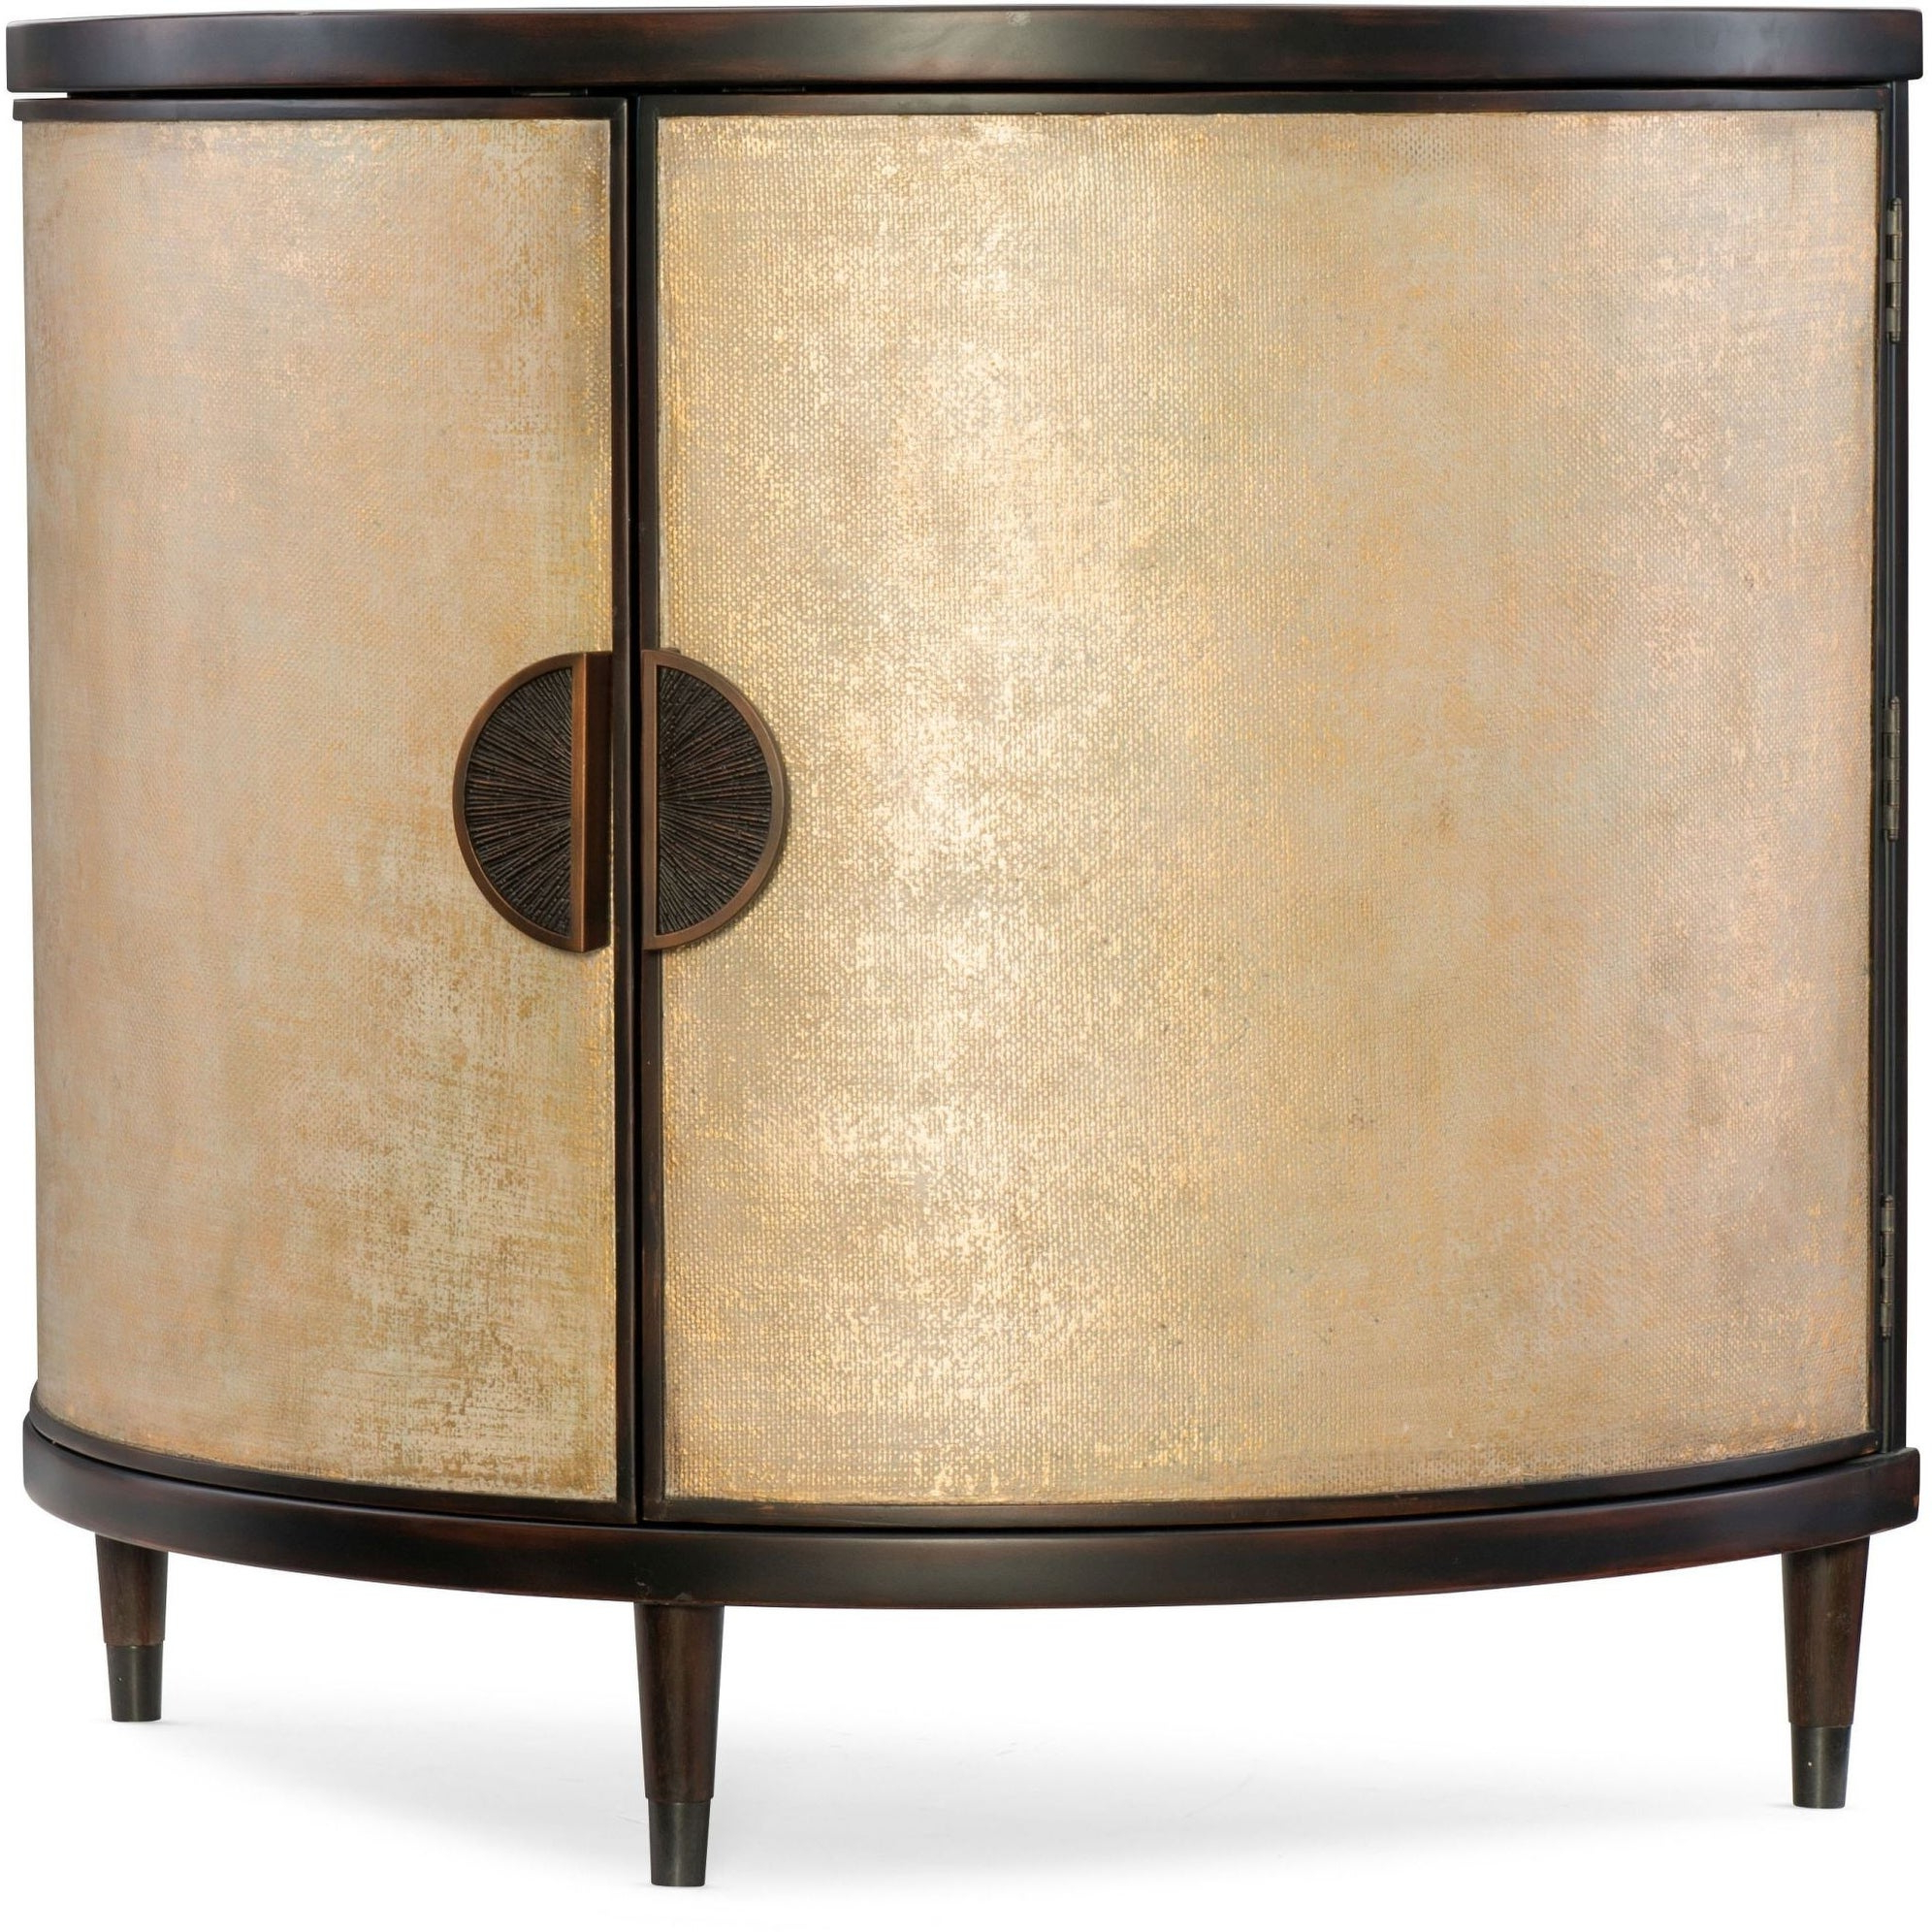 "Hooker Furniture 638 85314 Gld 42 1/4"" Wide Hardwood Cabinet From The  Melange – Em Demilune Collection – Black And Shimmer Cream Throughout Widely Used Melange Brockton Sideboards (Gallery 16 of 20)"